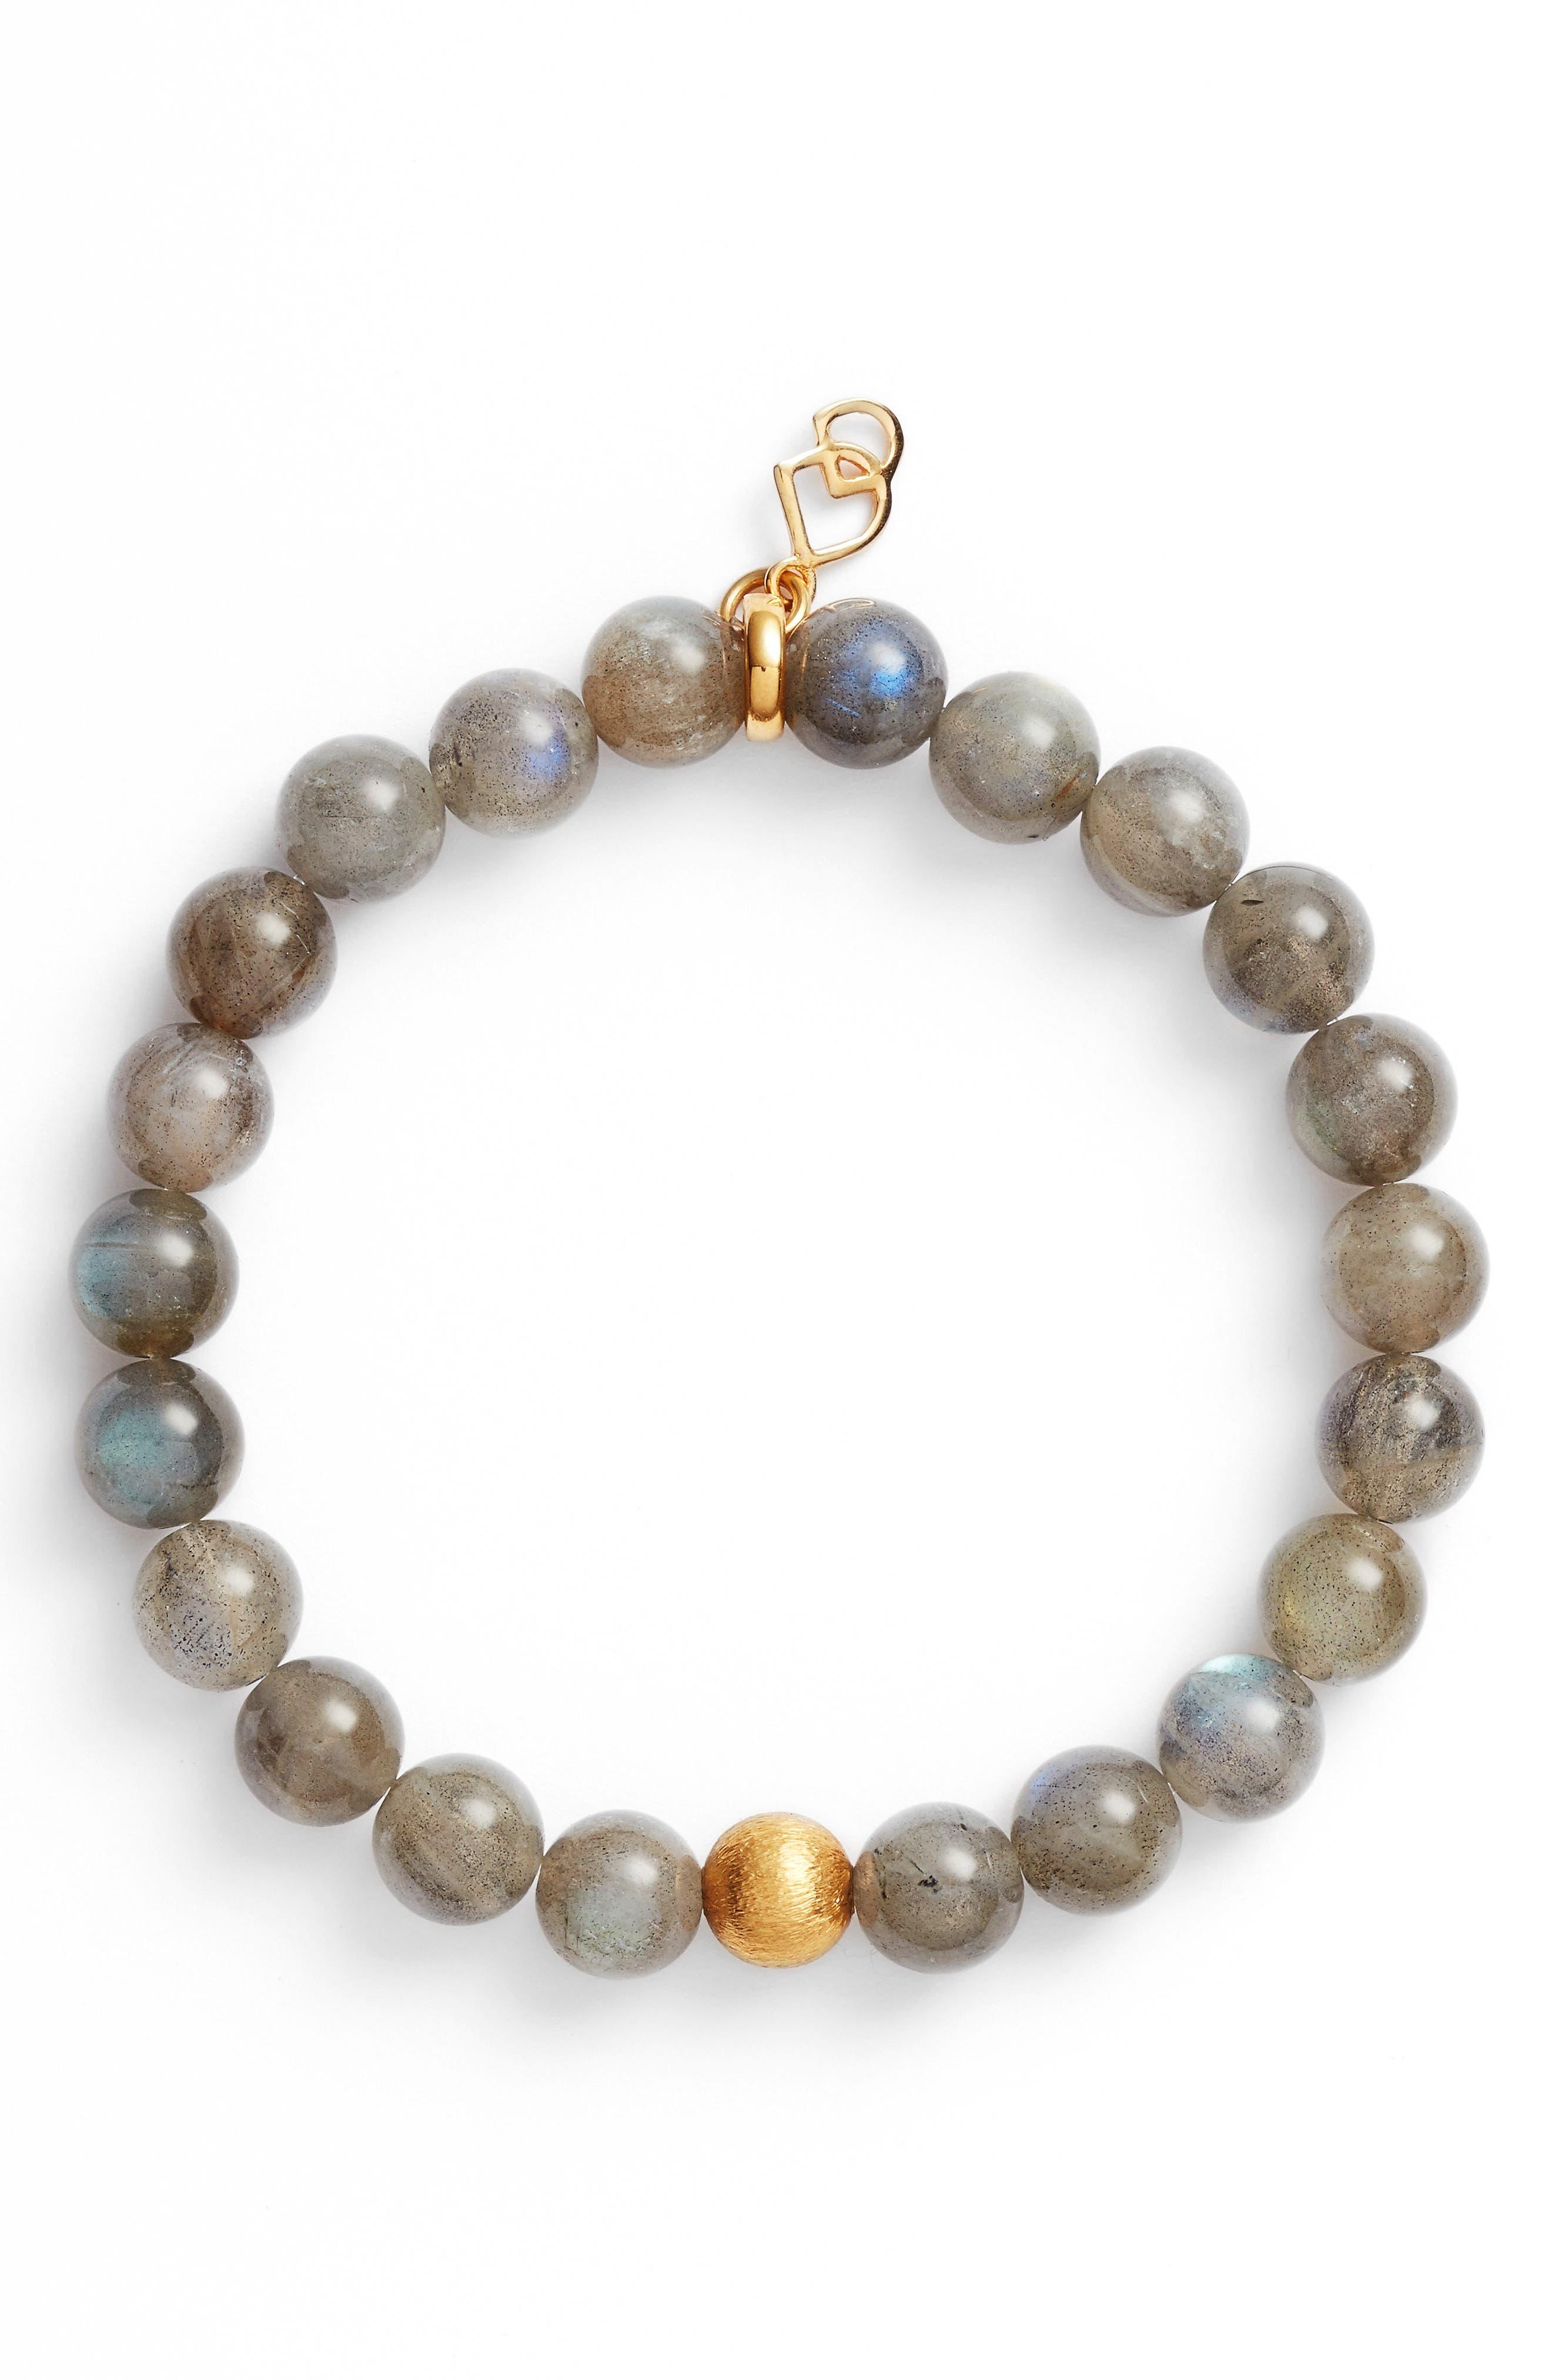 Sphere Semiprecious Stone Elastic Bracelet,                         Main,                         color, LABRADORITE/ GOLD